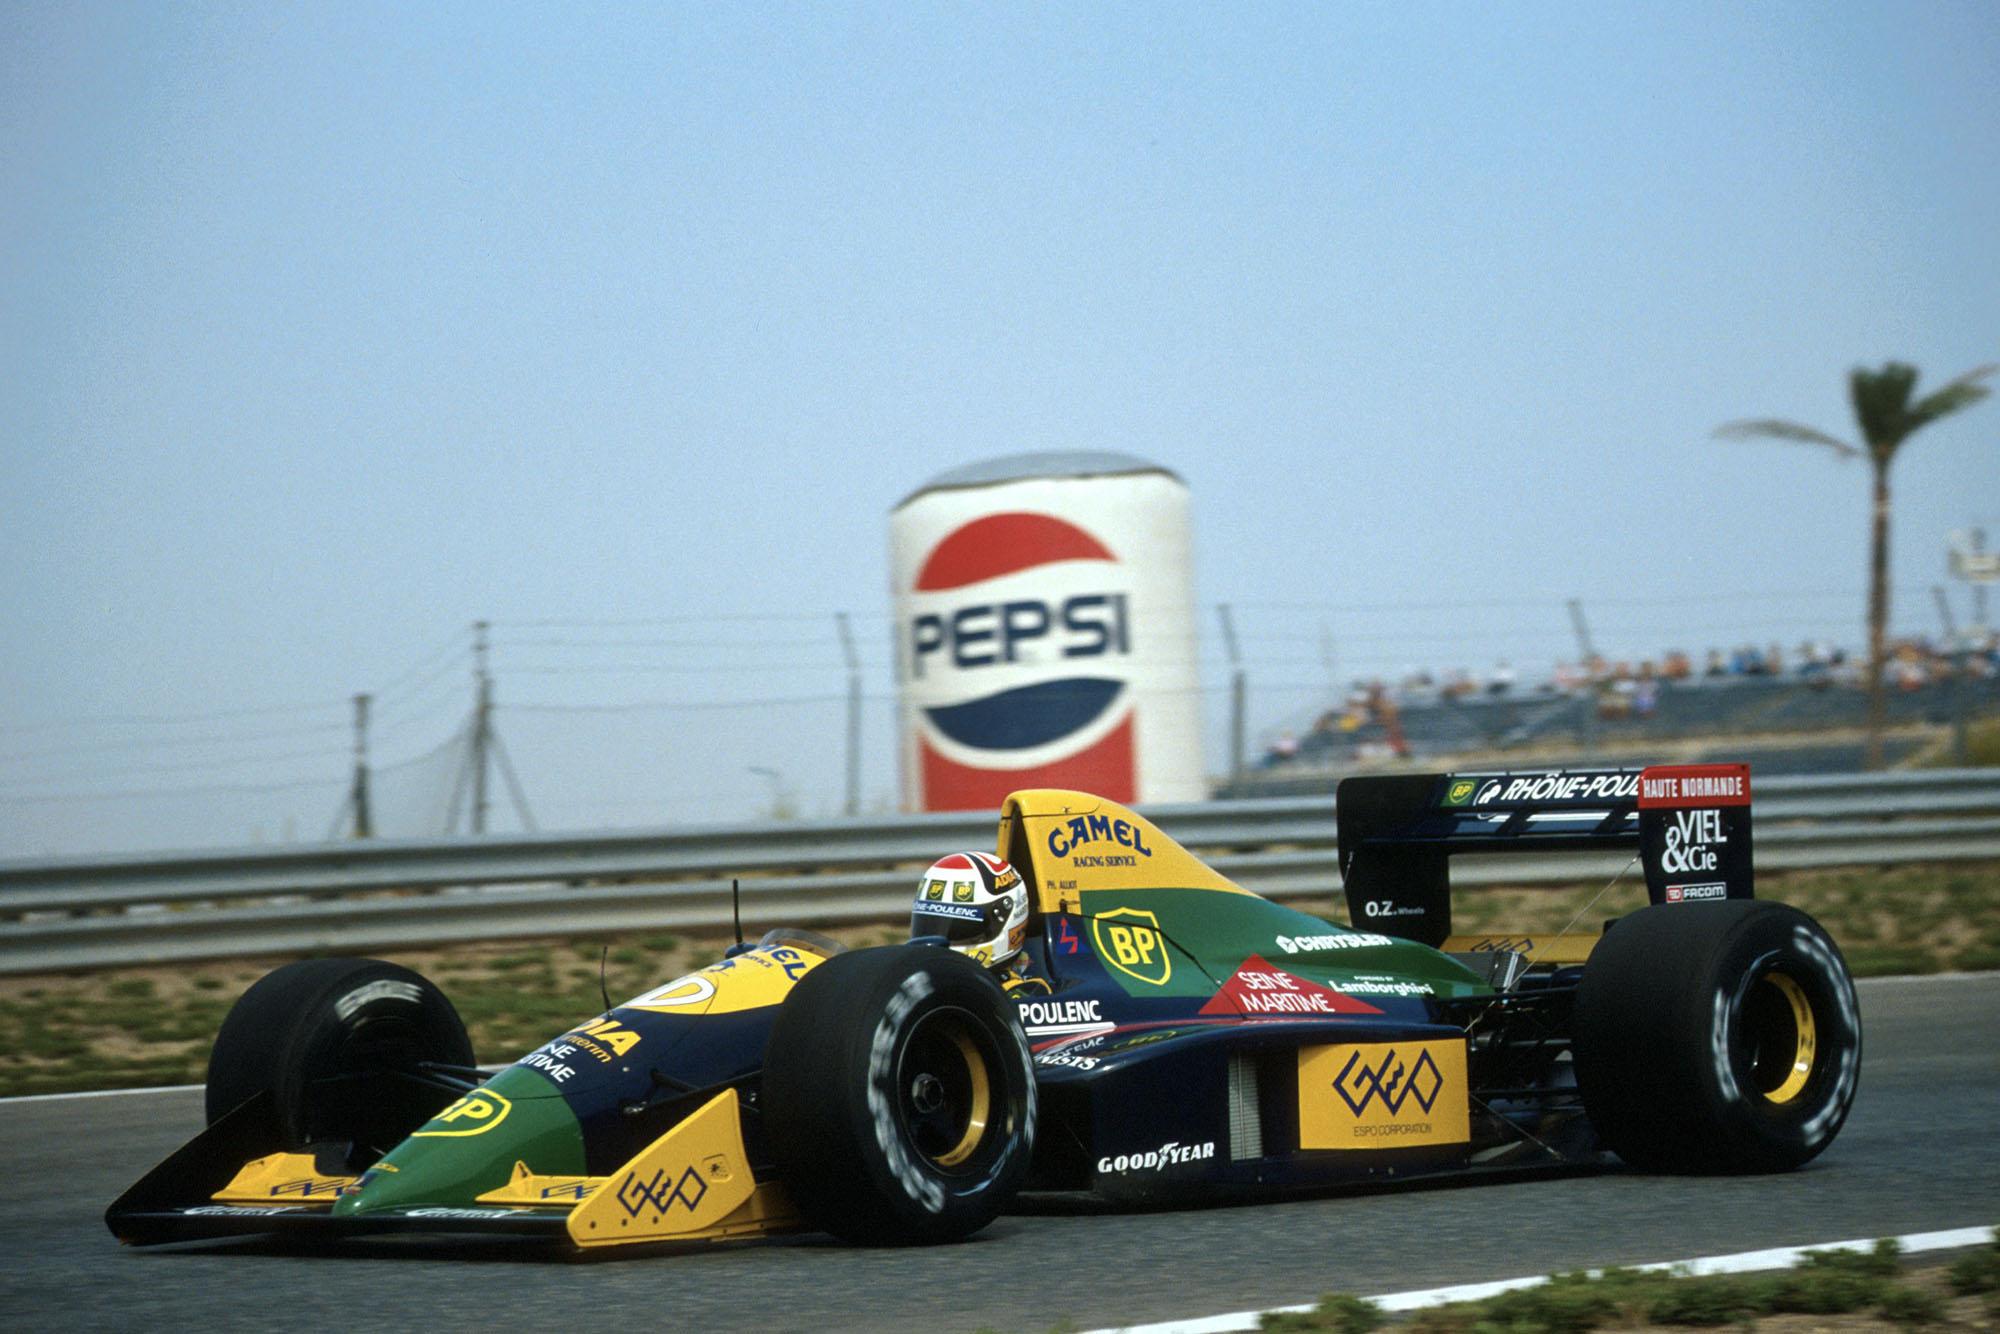 1989 SPA GP Alliot